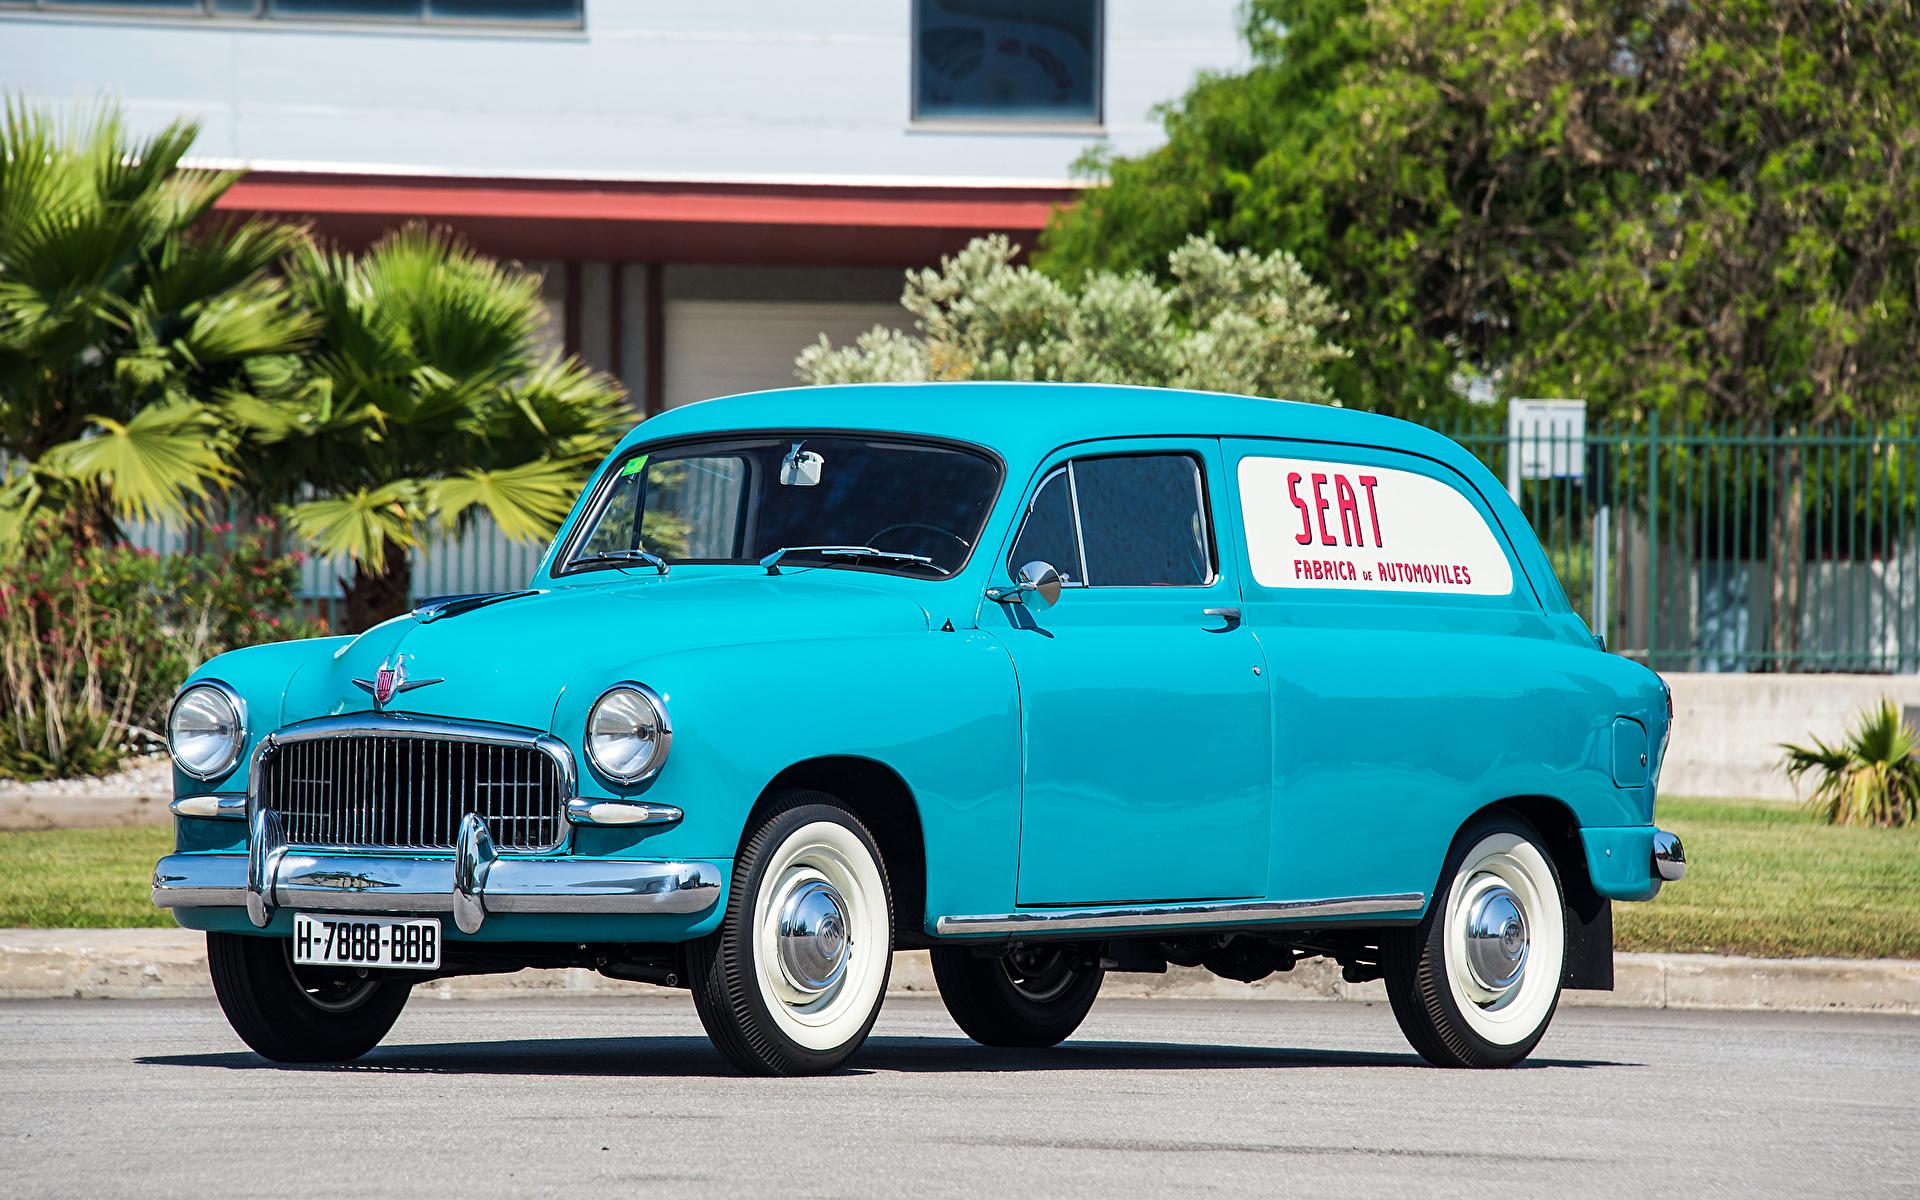 Pictures Seat 1959-63 1400 B Furgoneta Retro Light Blue auto 1920x1200 antique vintage Cars automobile